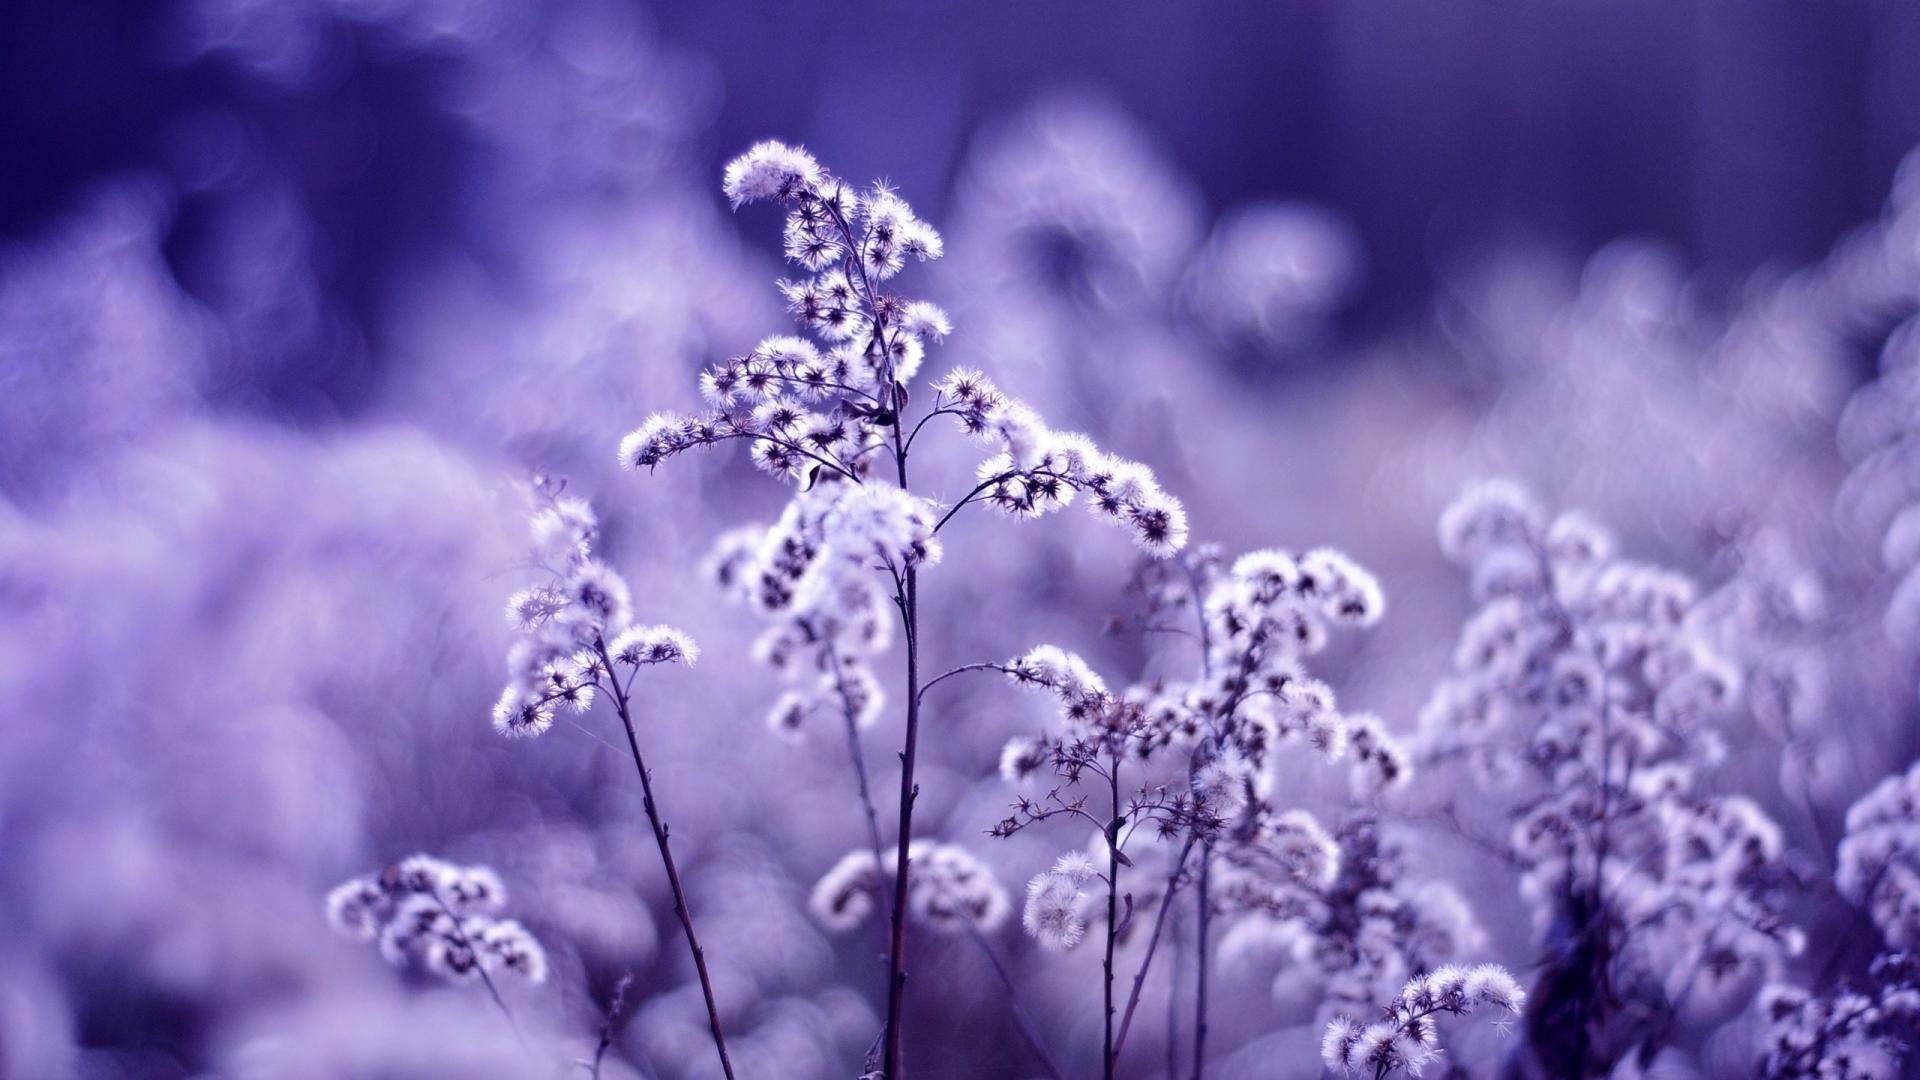 VioletClan (livvydoodle)